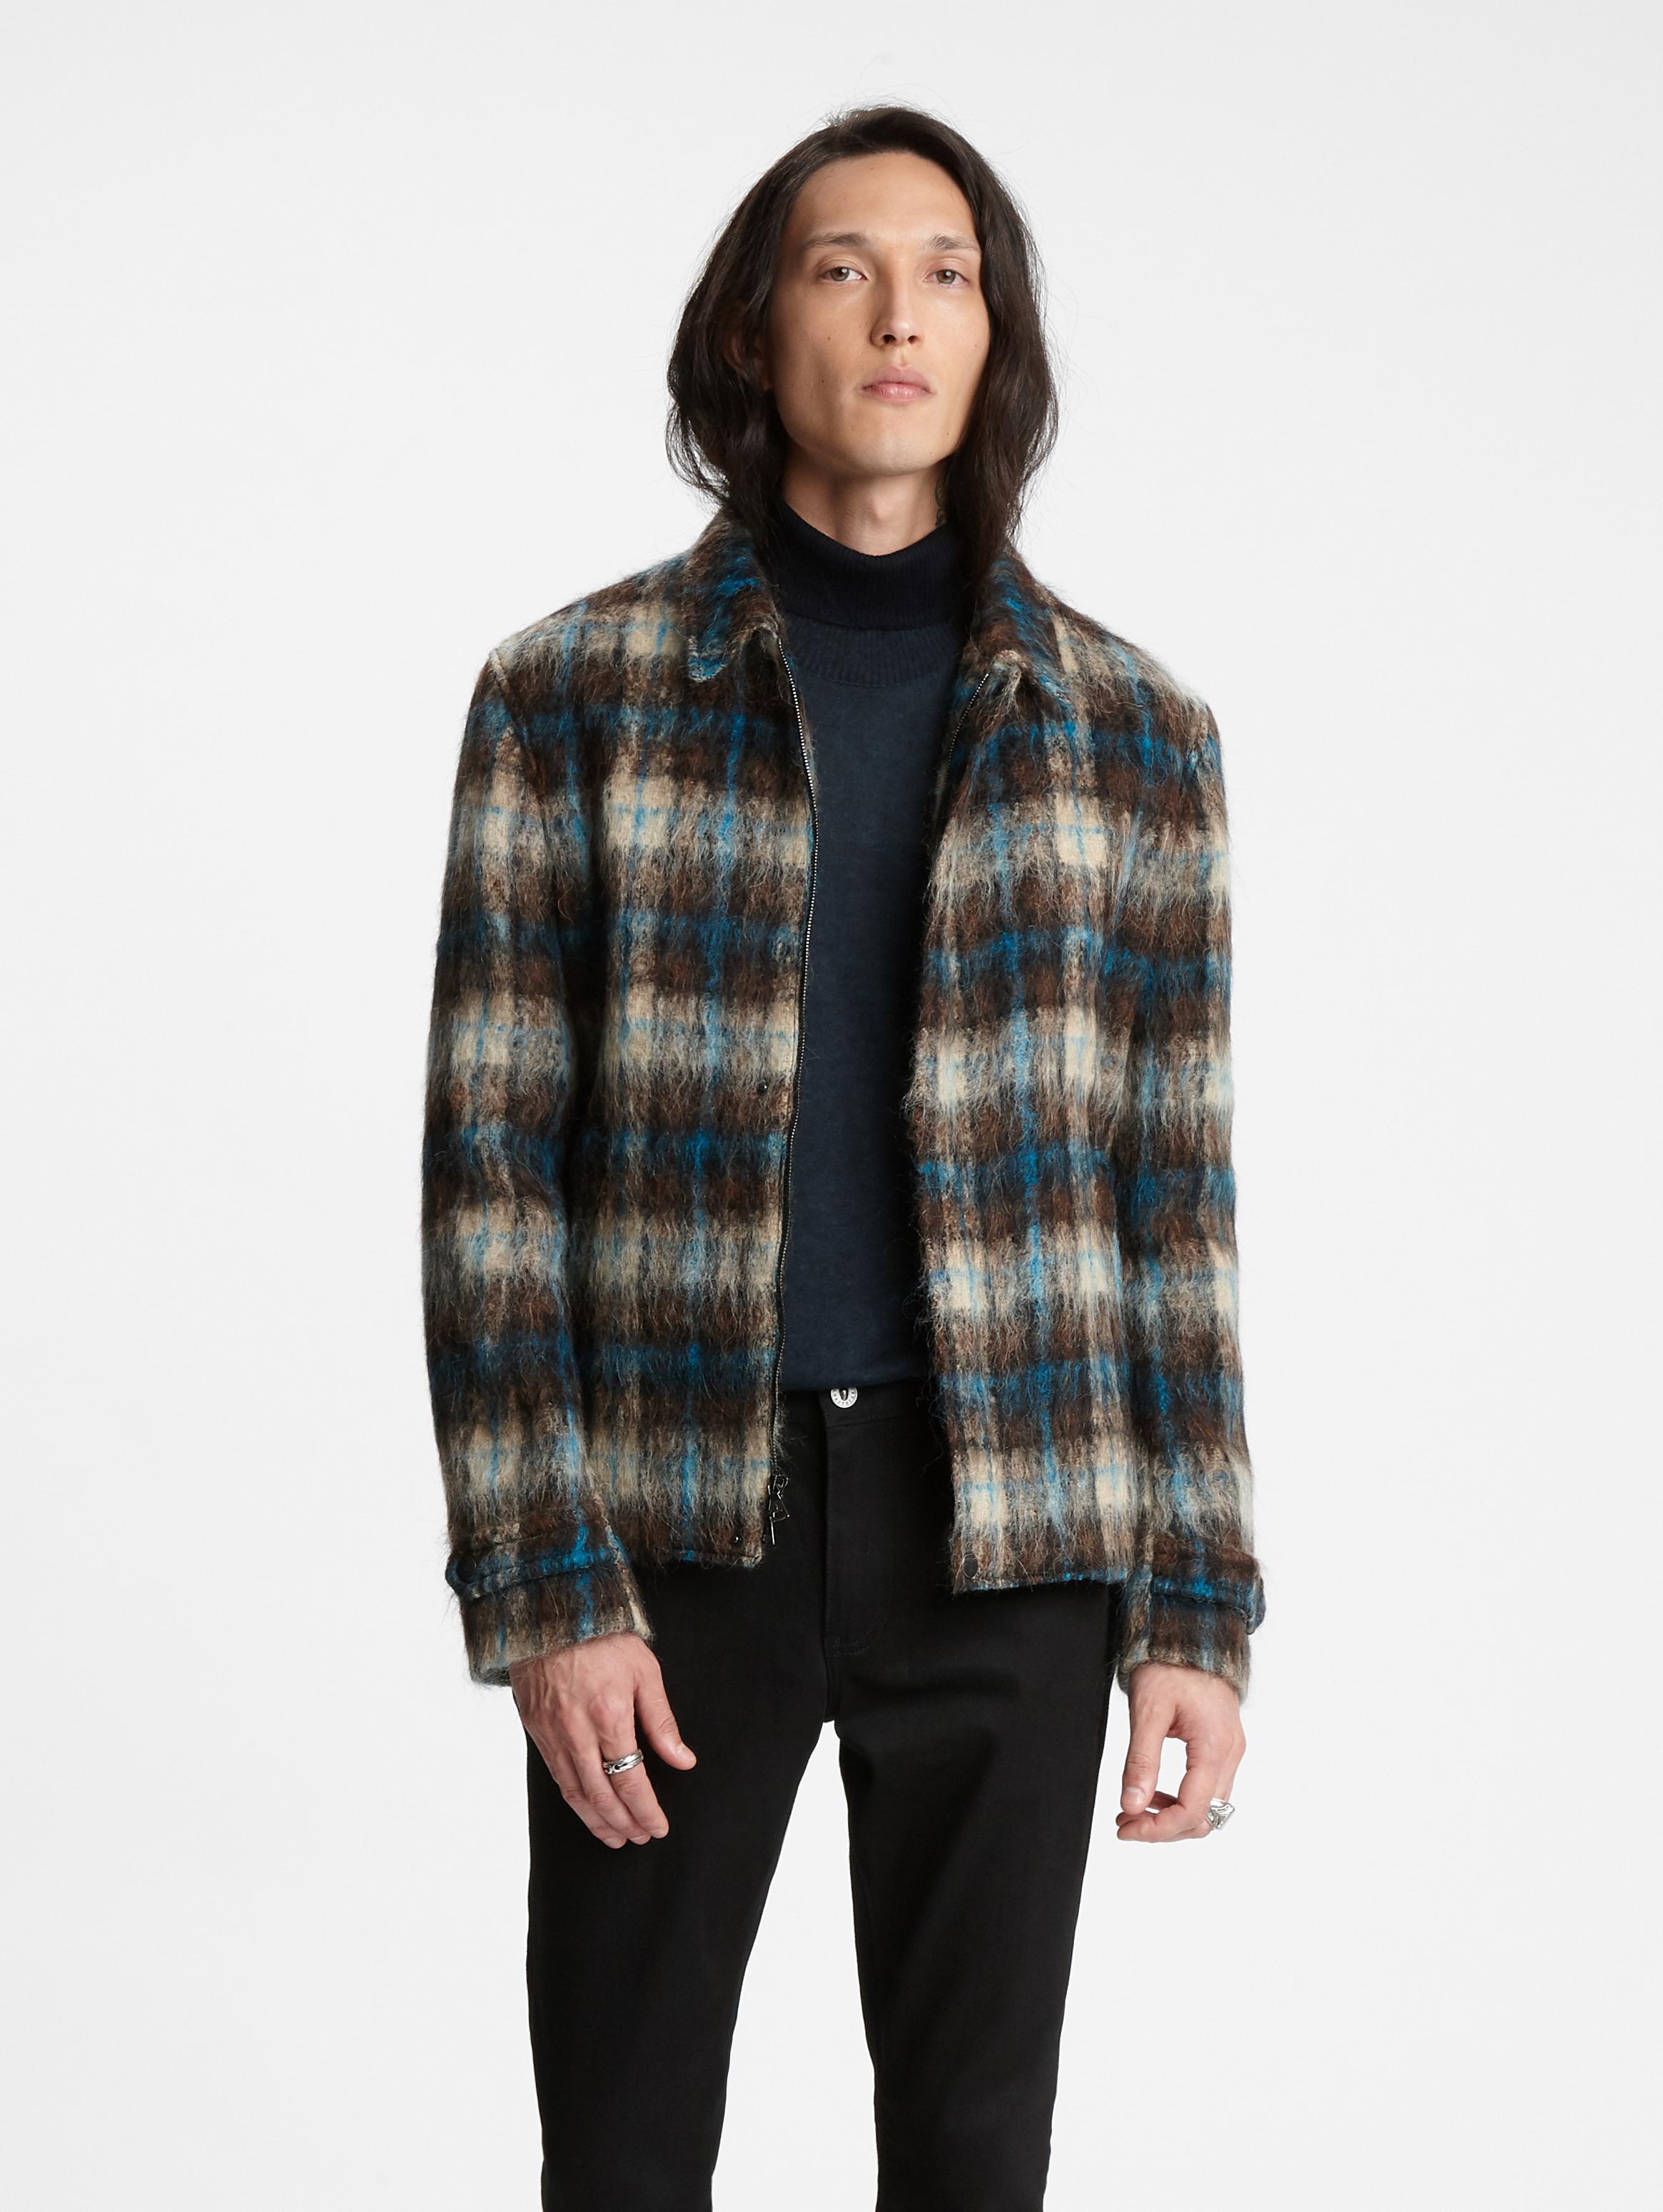 John Varvatos Alpaca Plaid Jacquard Jacket Charc Brown